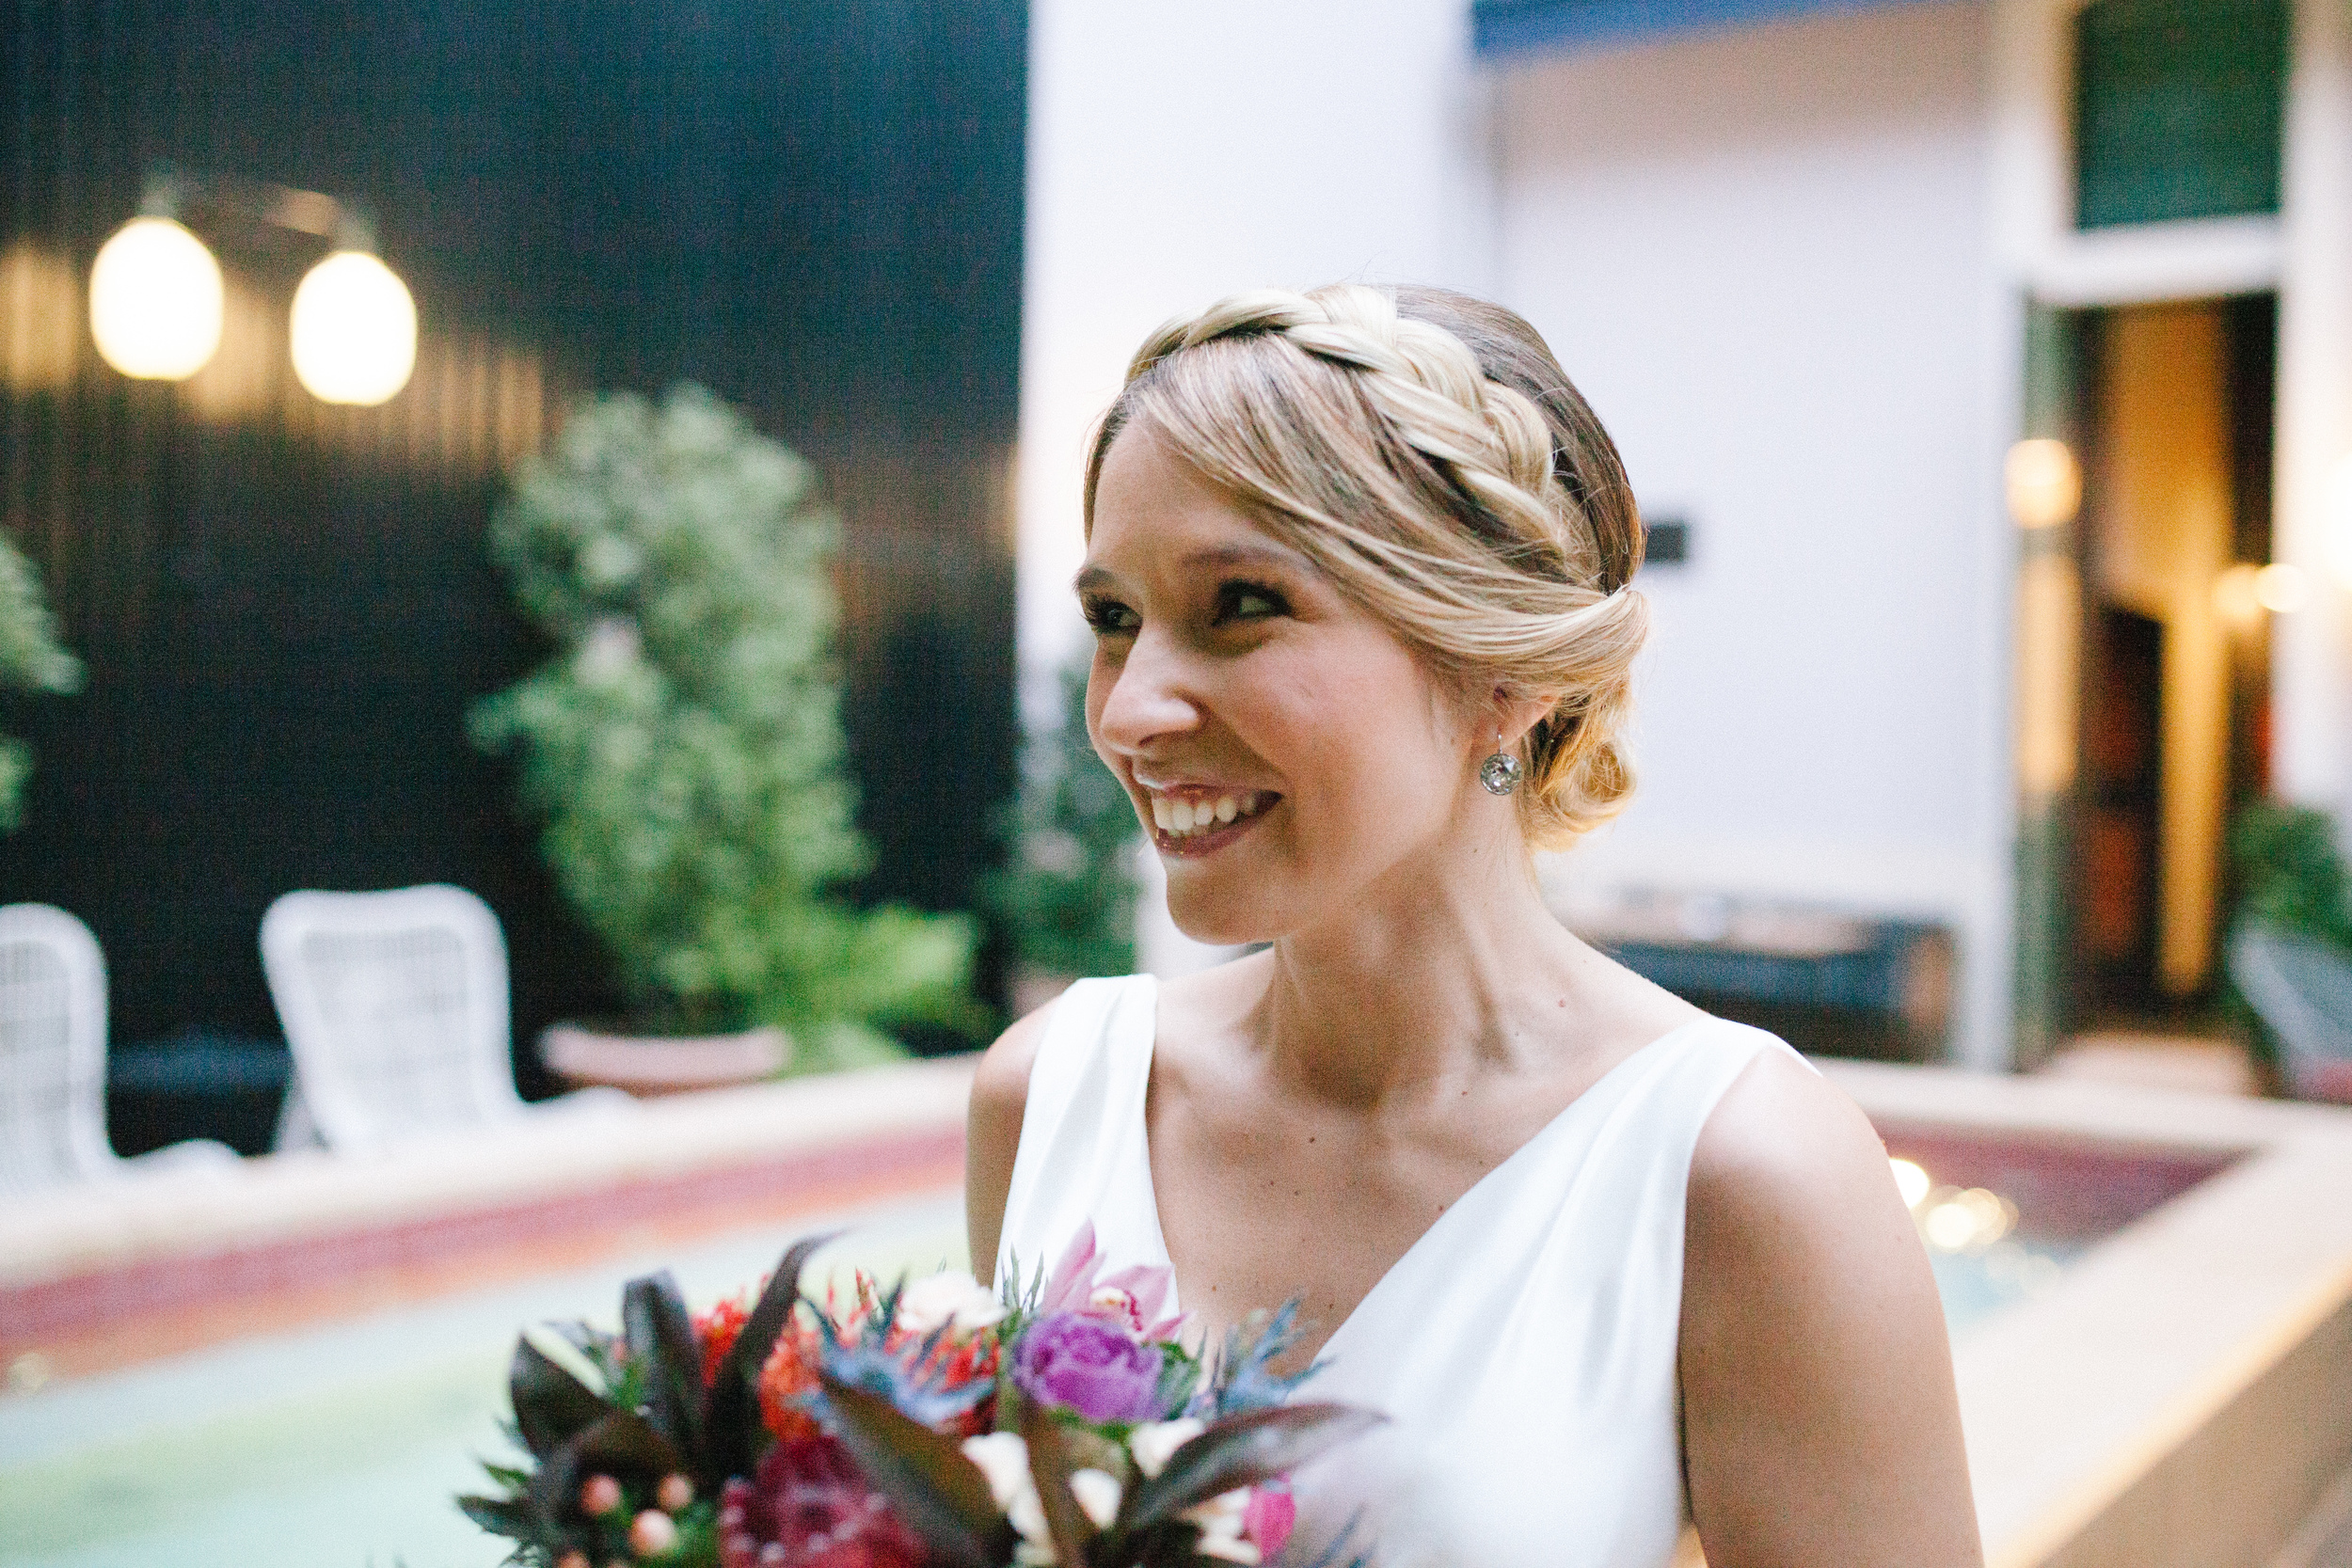 mariarao+wedding+estufa+fria-166.jpg